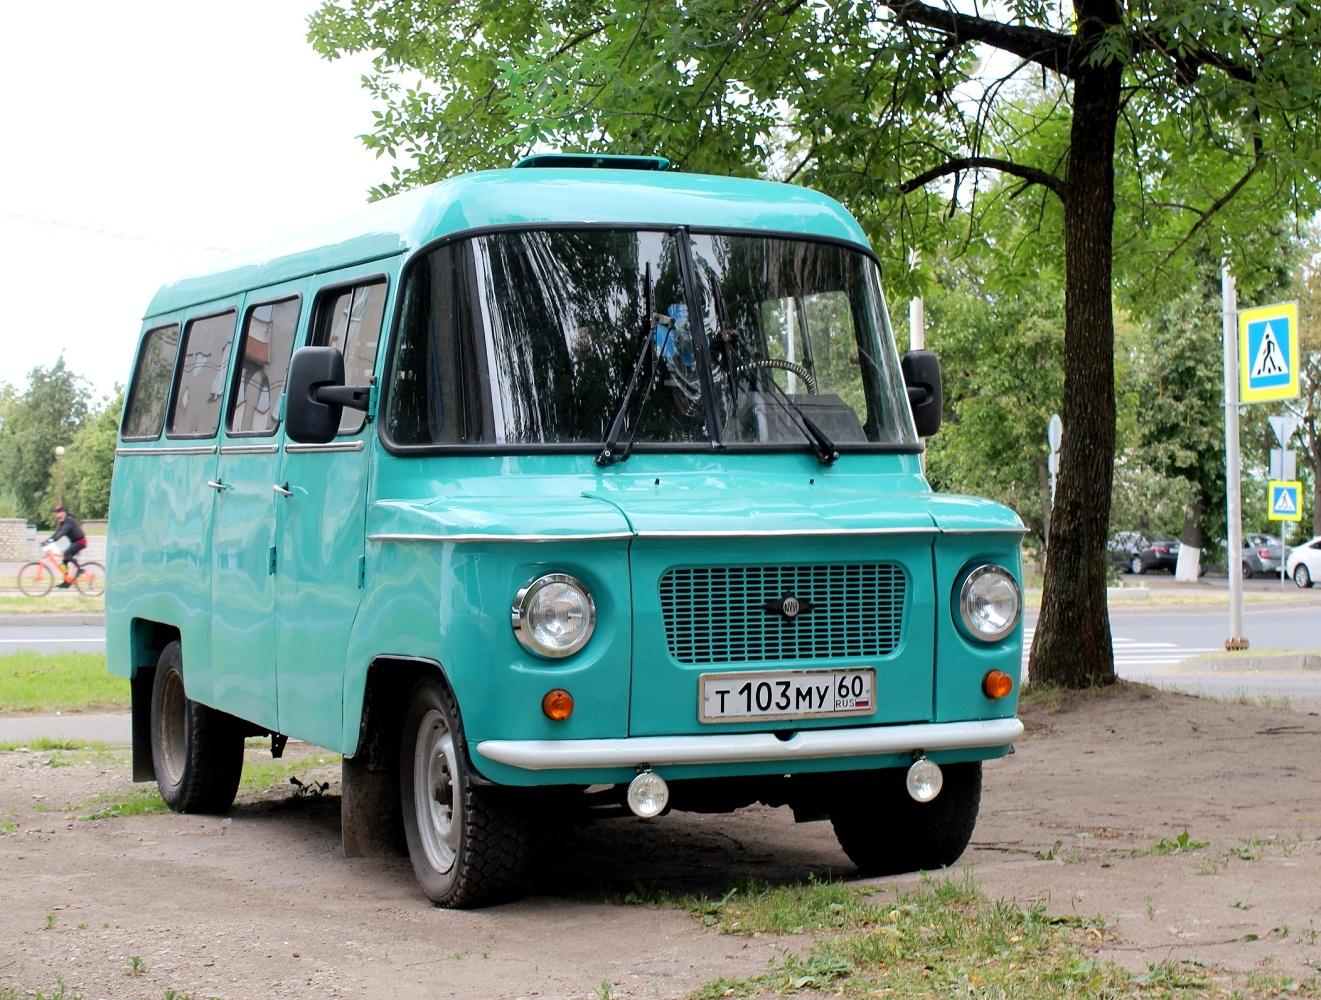 Микроавтобус Nysa 522M #Т 103 МУ 60. Псков, улица Максима Горького